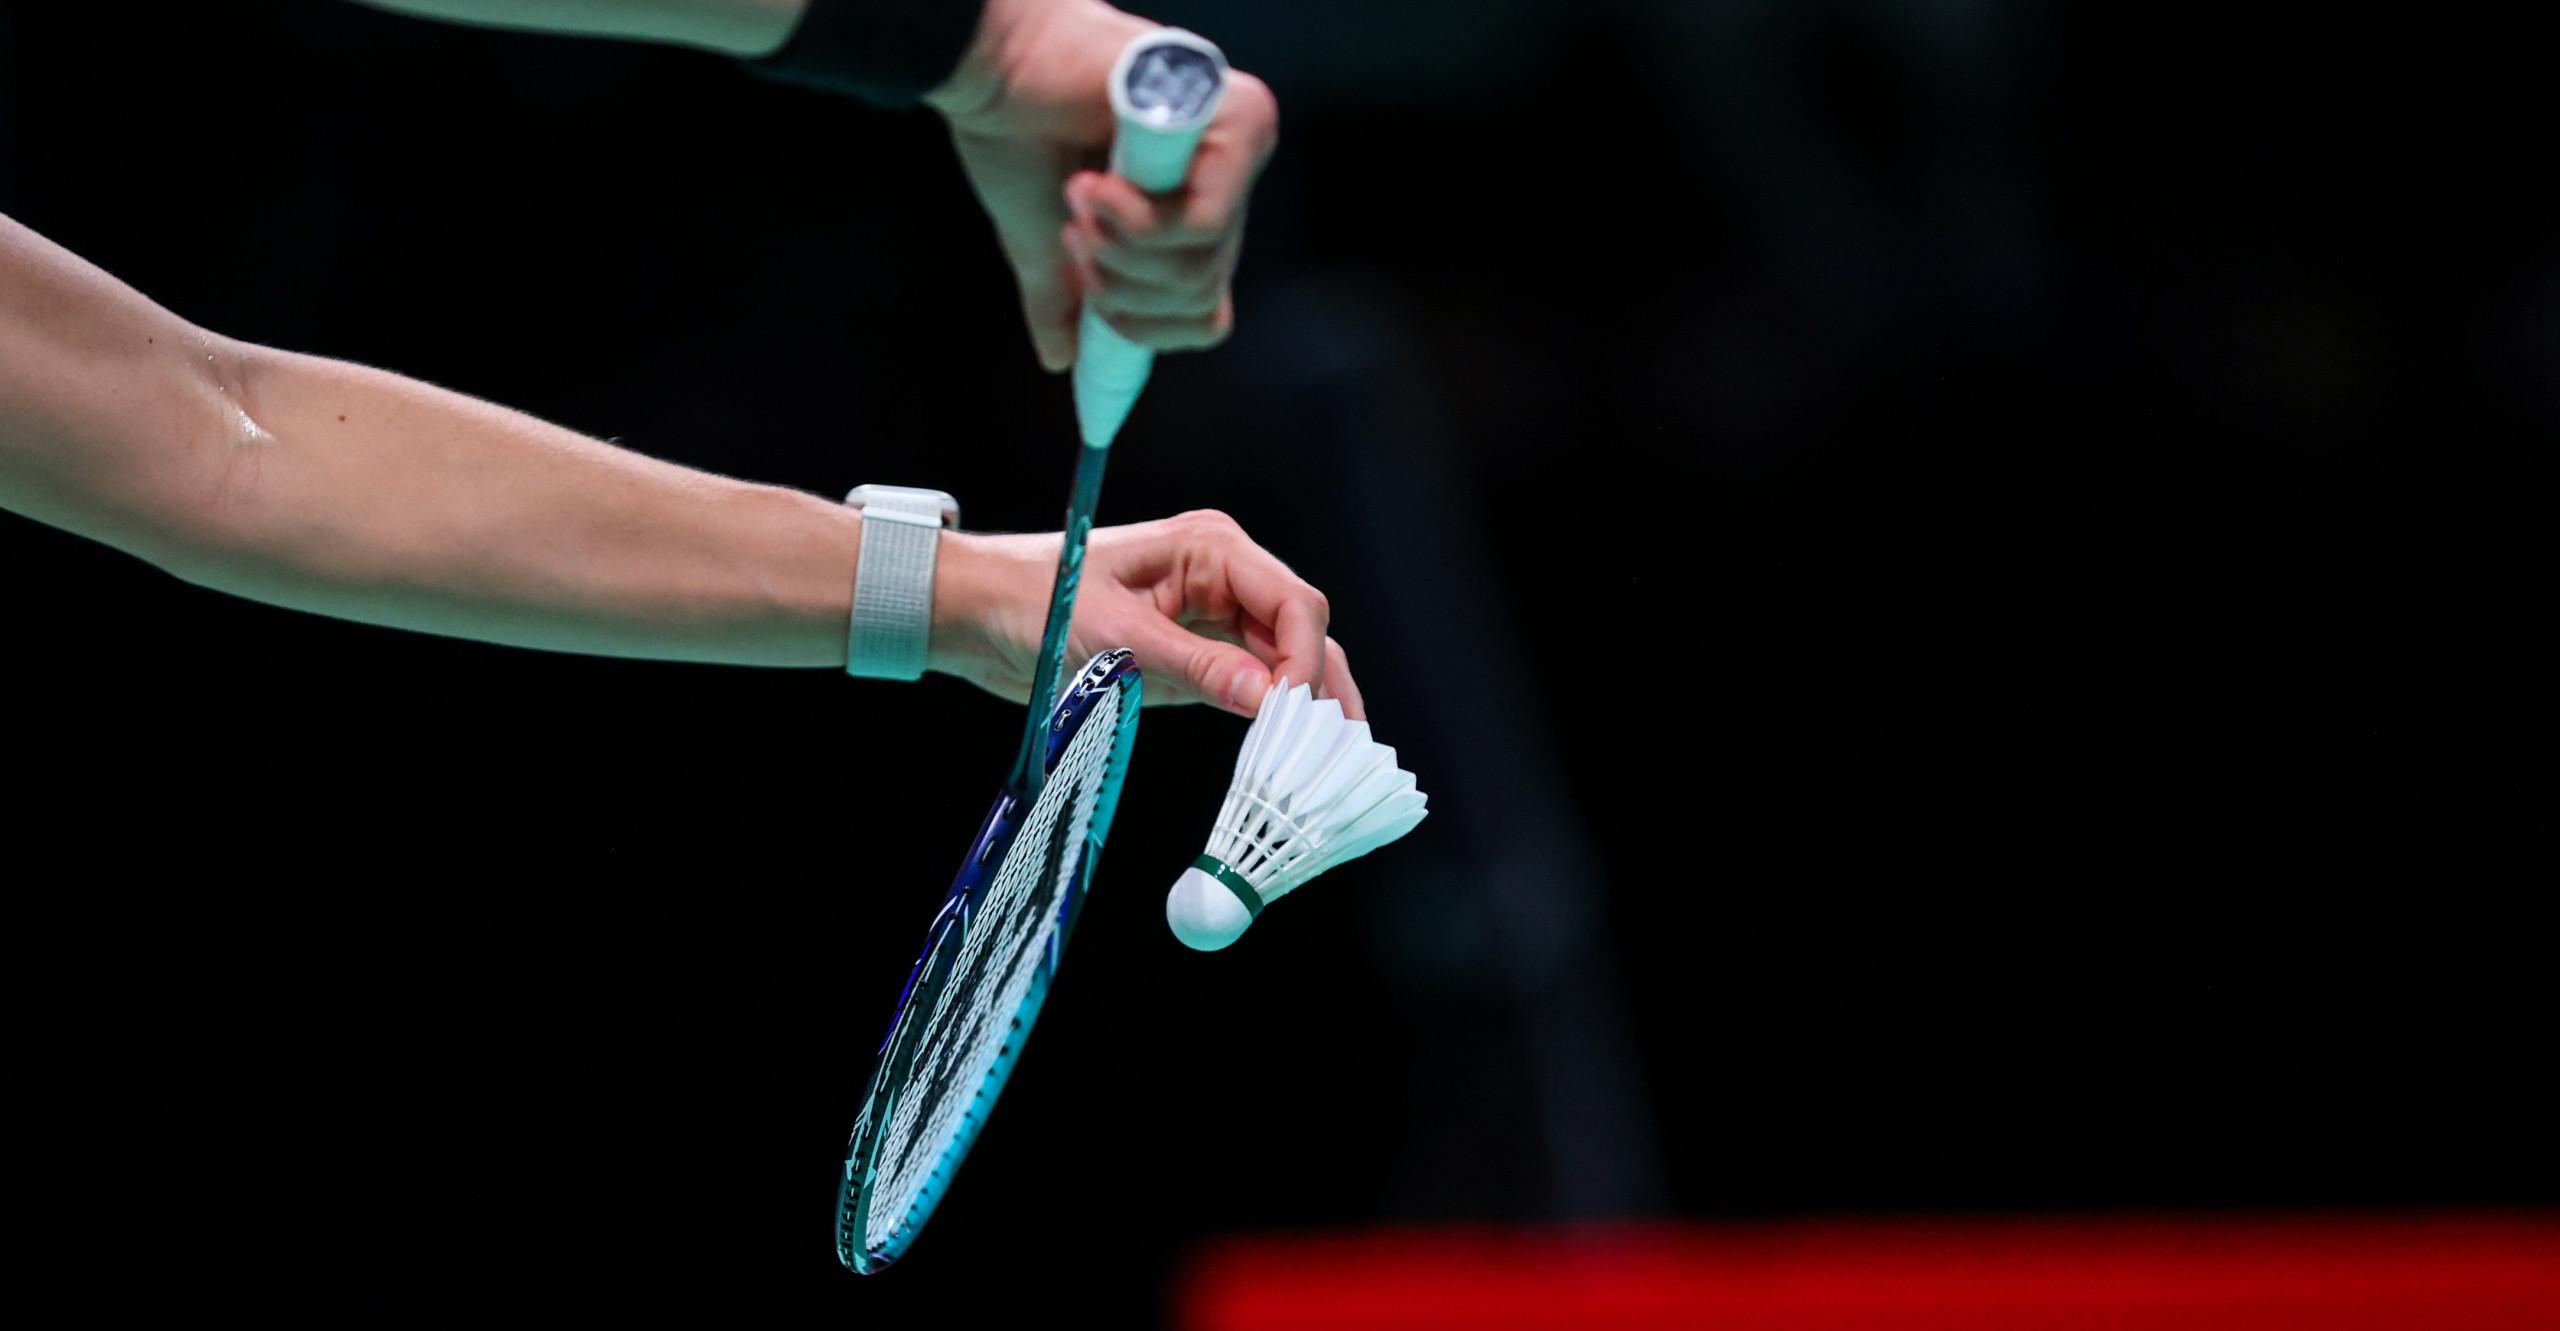 BWF Membership Grant Programme Turns Focus to 'Bringing Badminton Back'